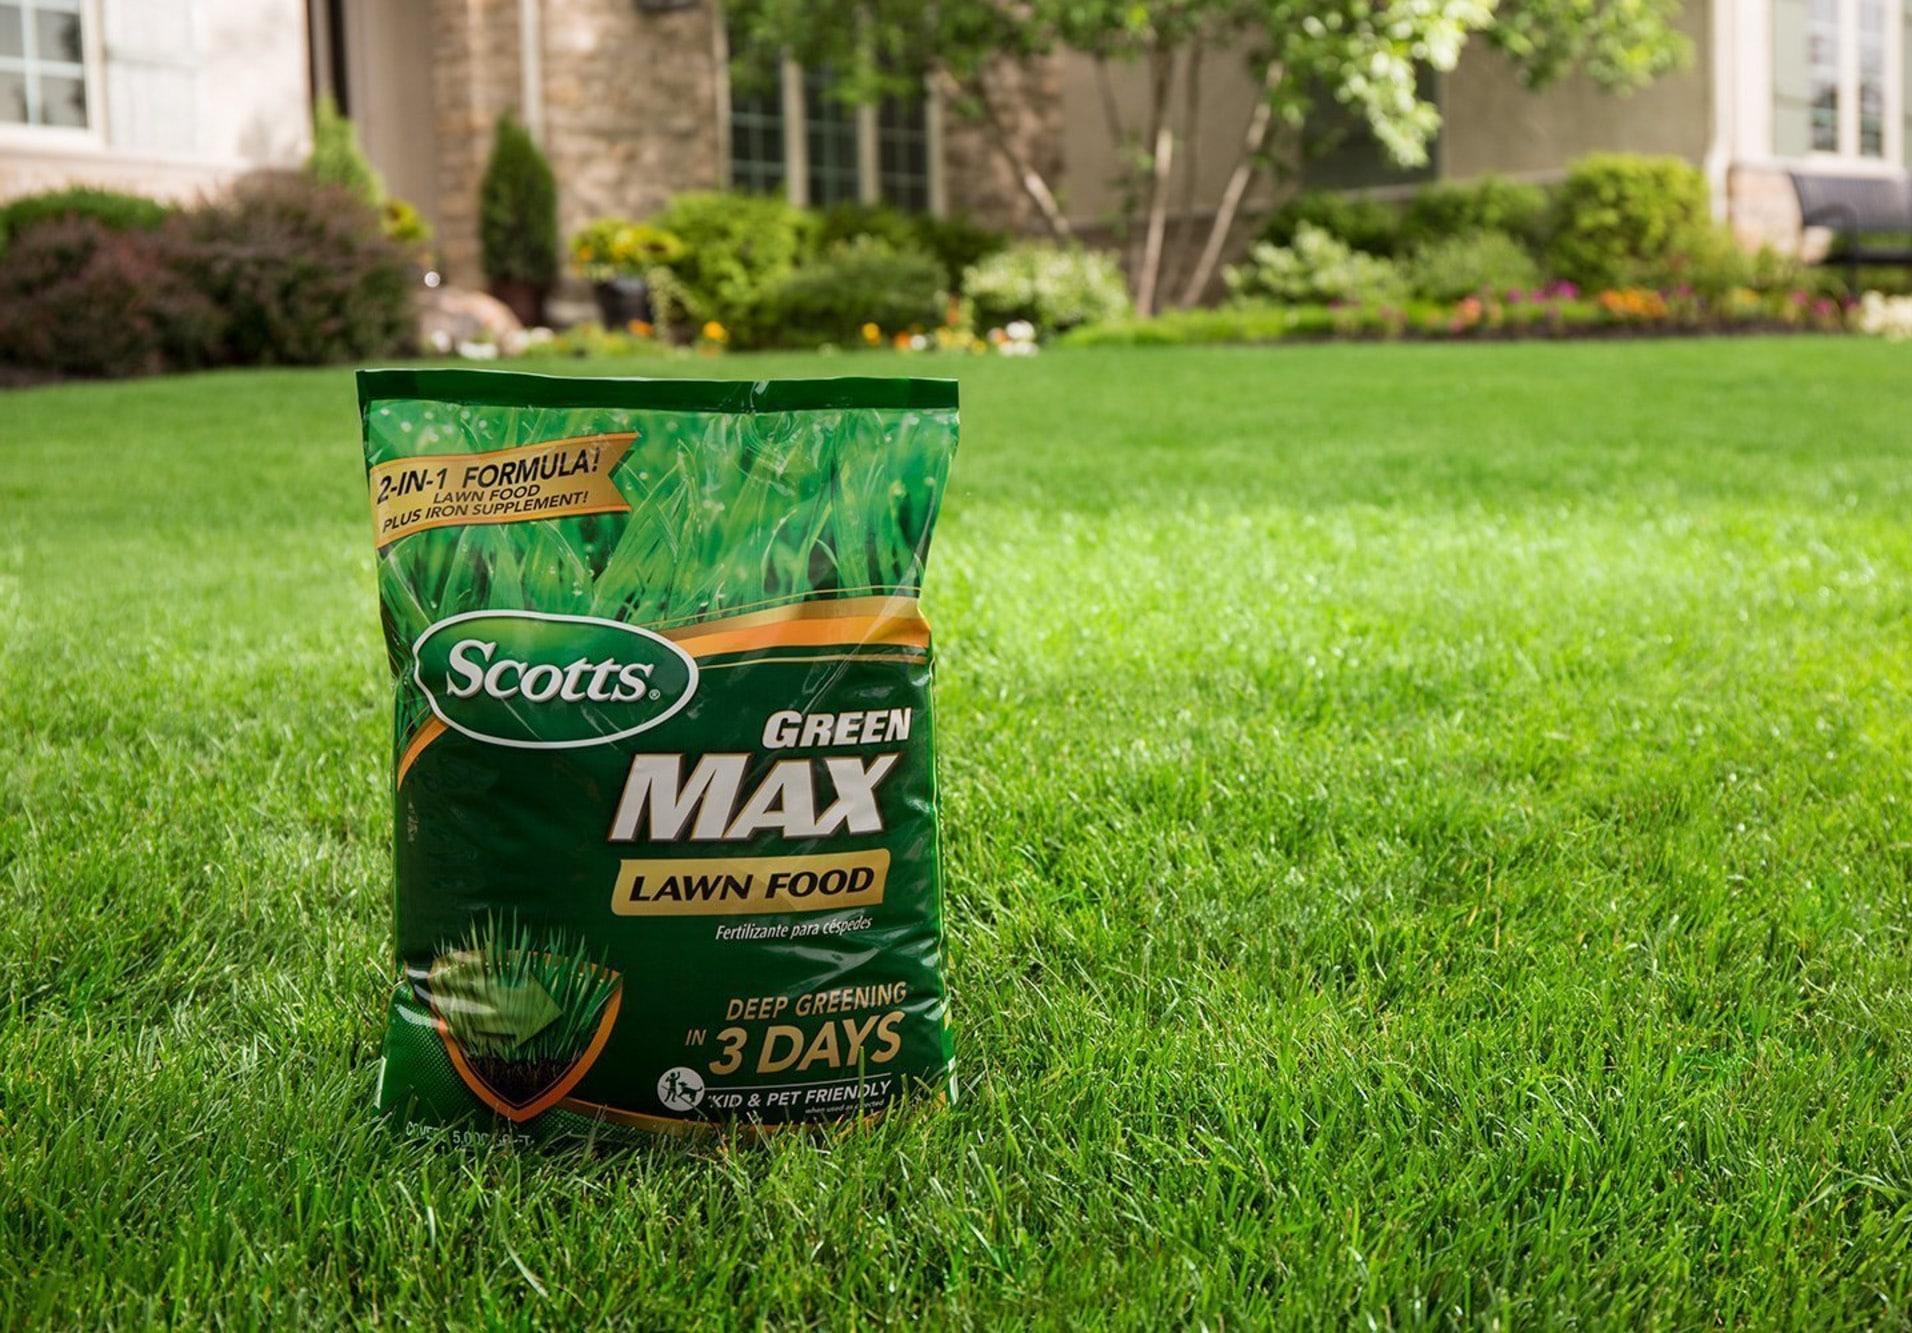 5 Best Lawn Fertilizers – Make The Neighborhood Envy Your Lawn